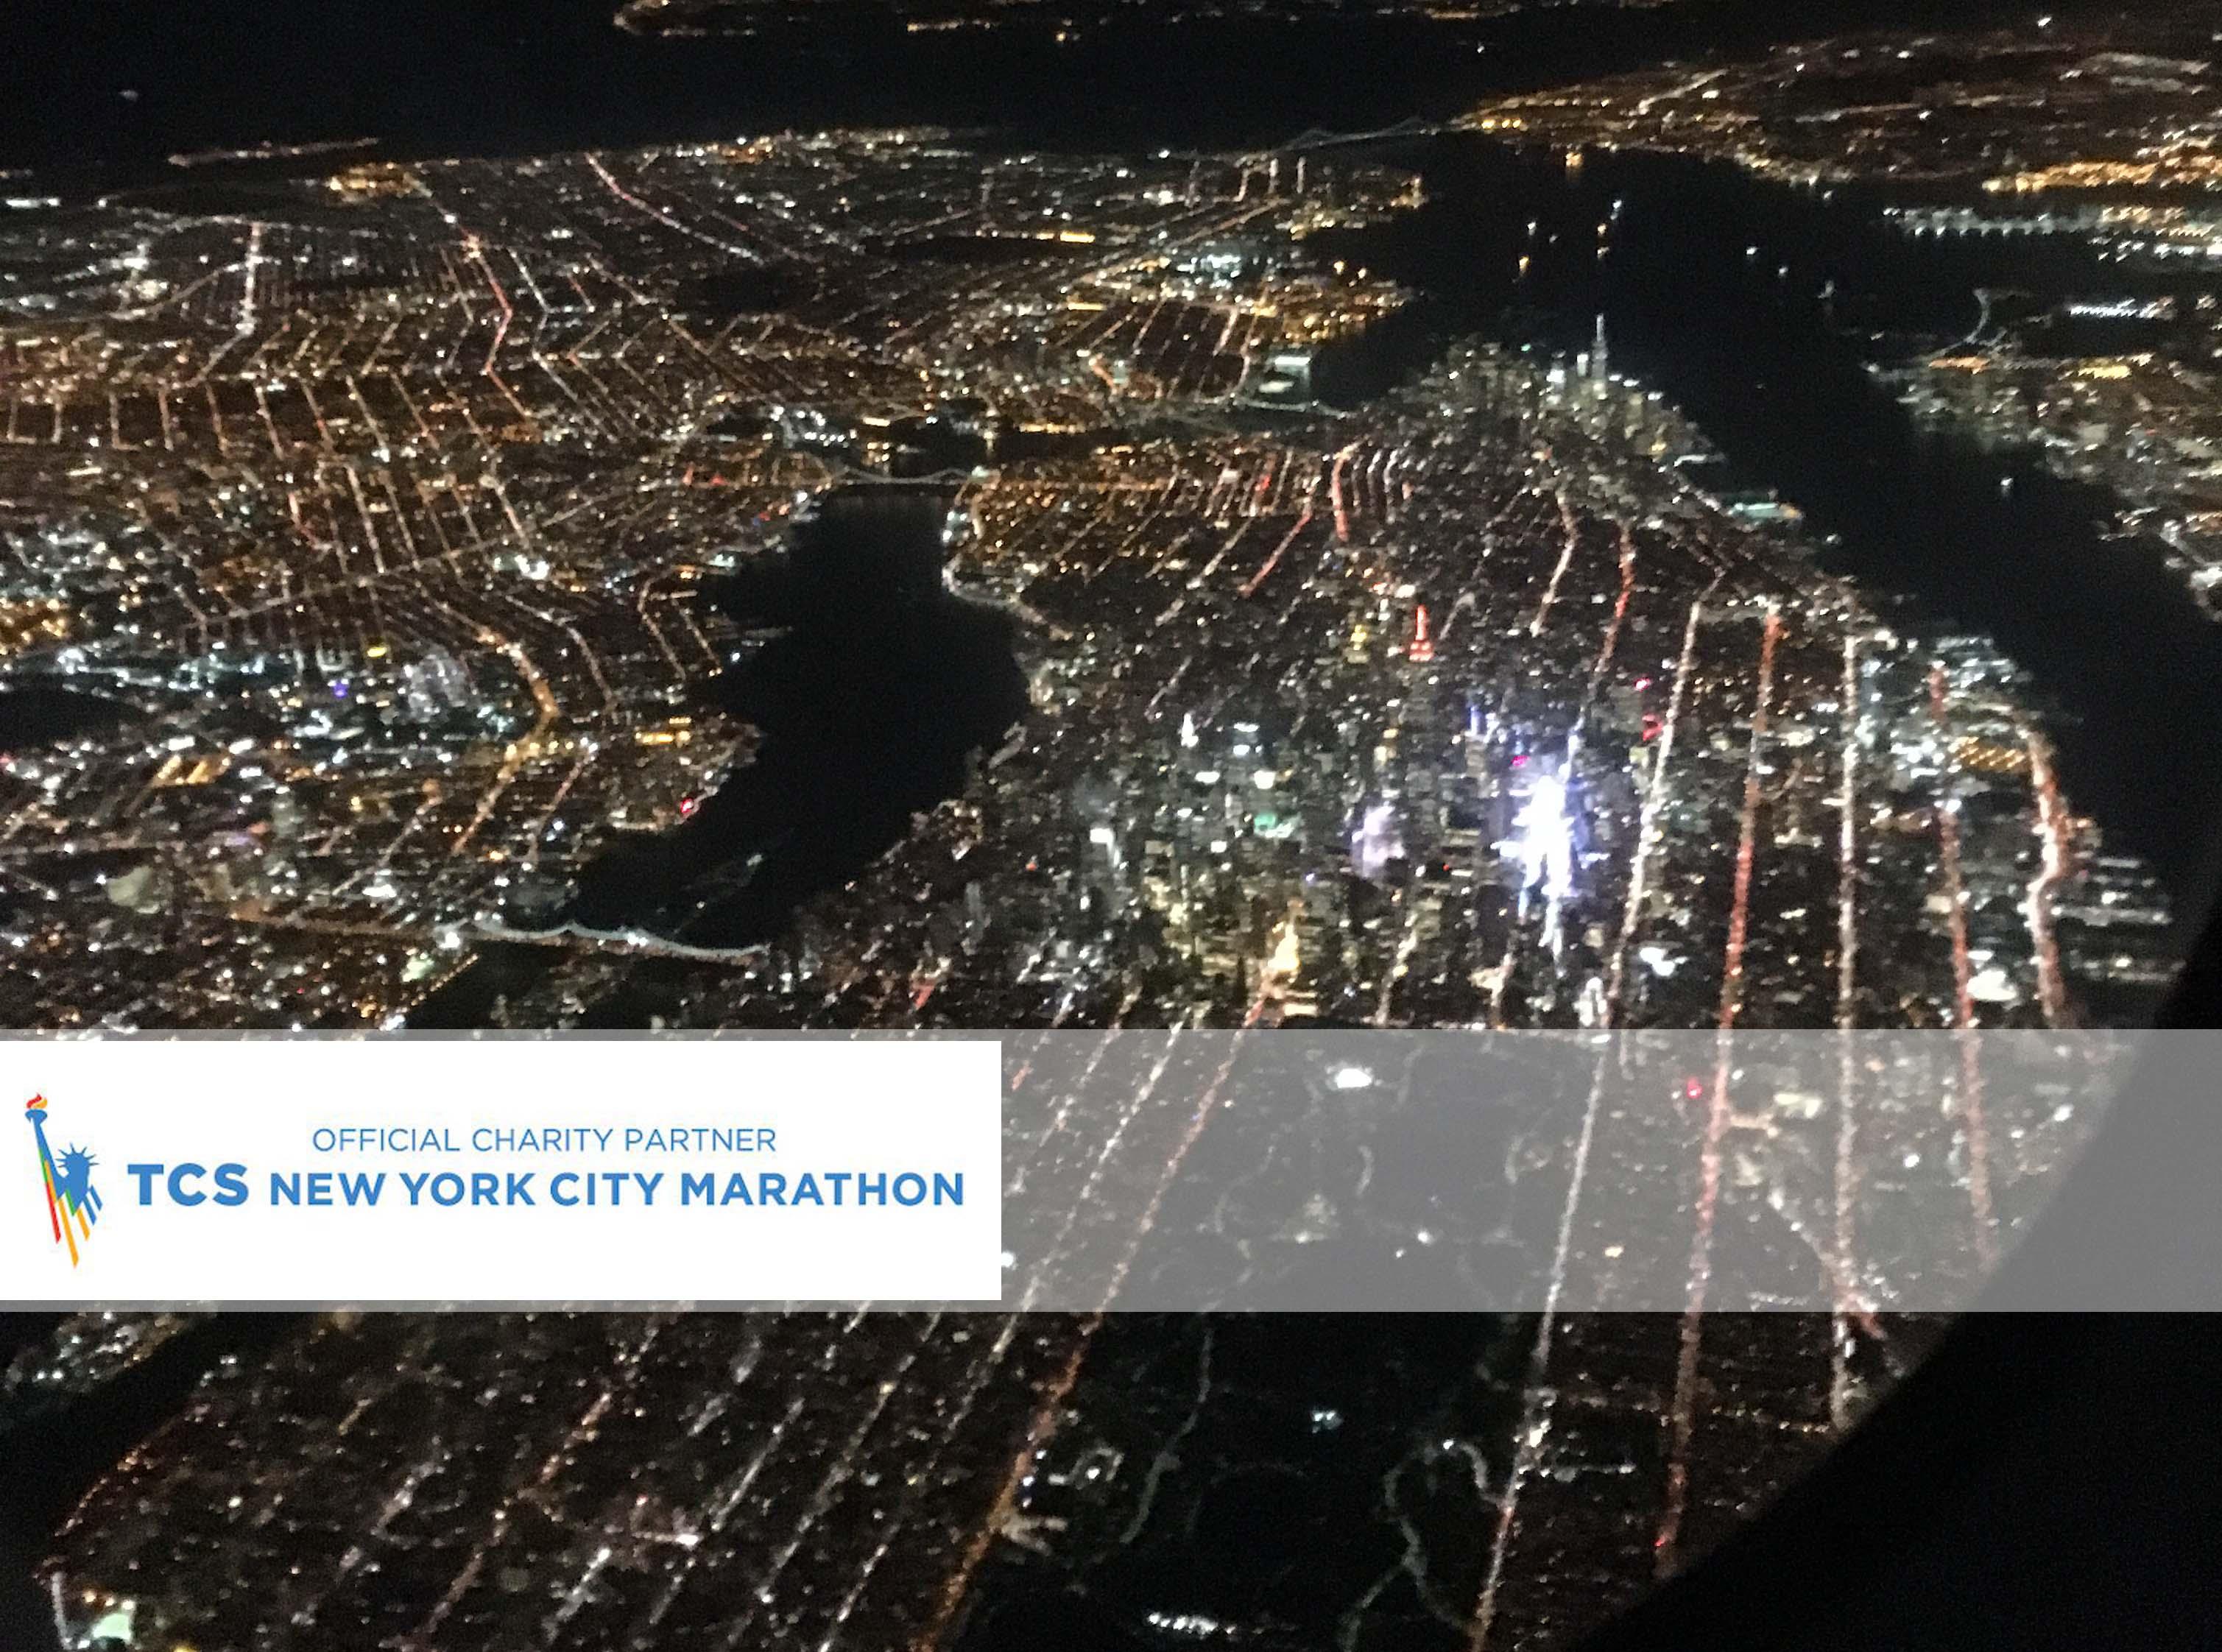 TCS New York City Marathon